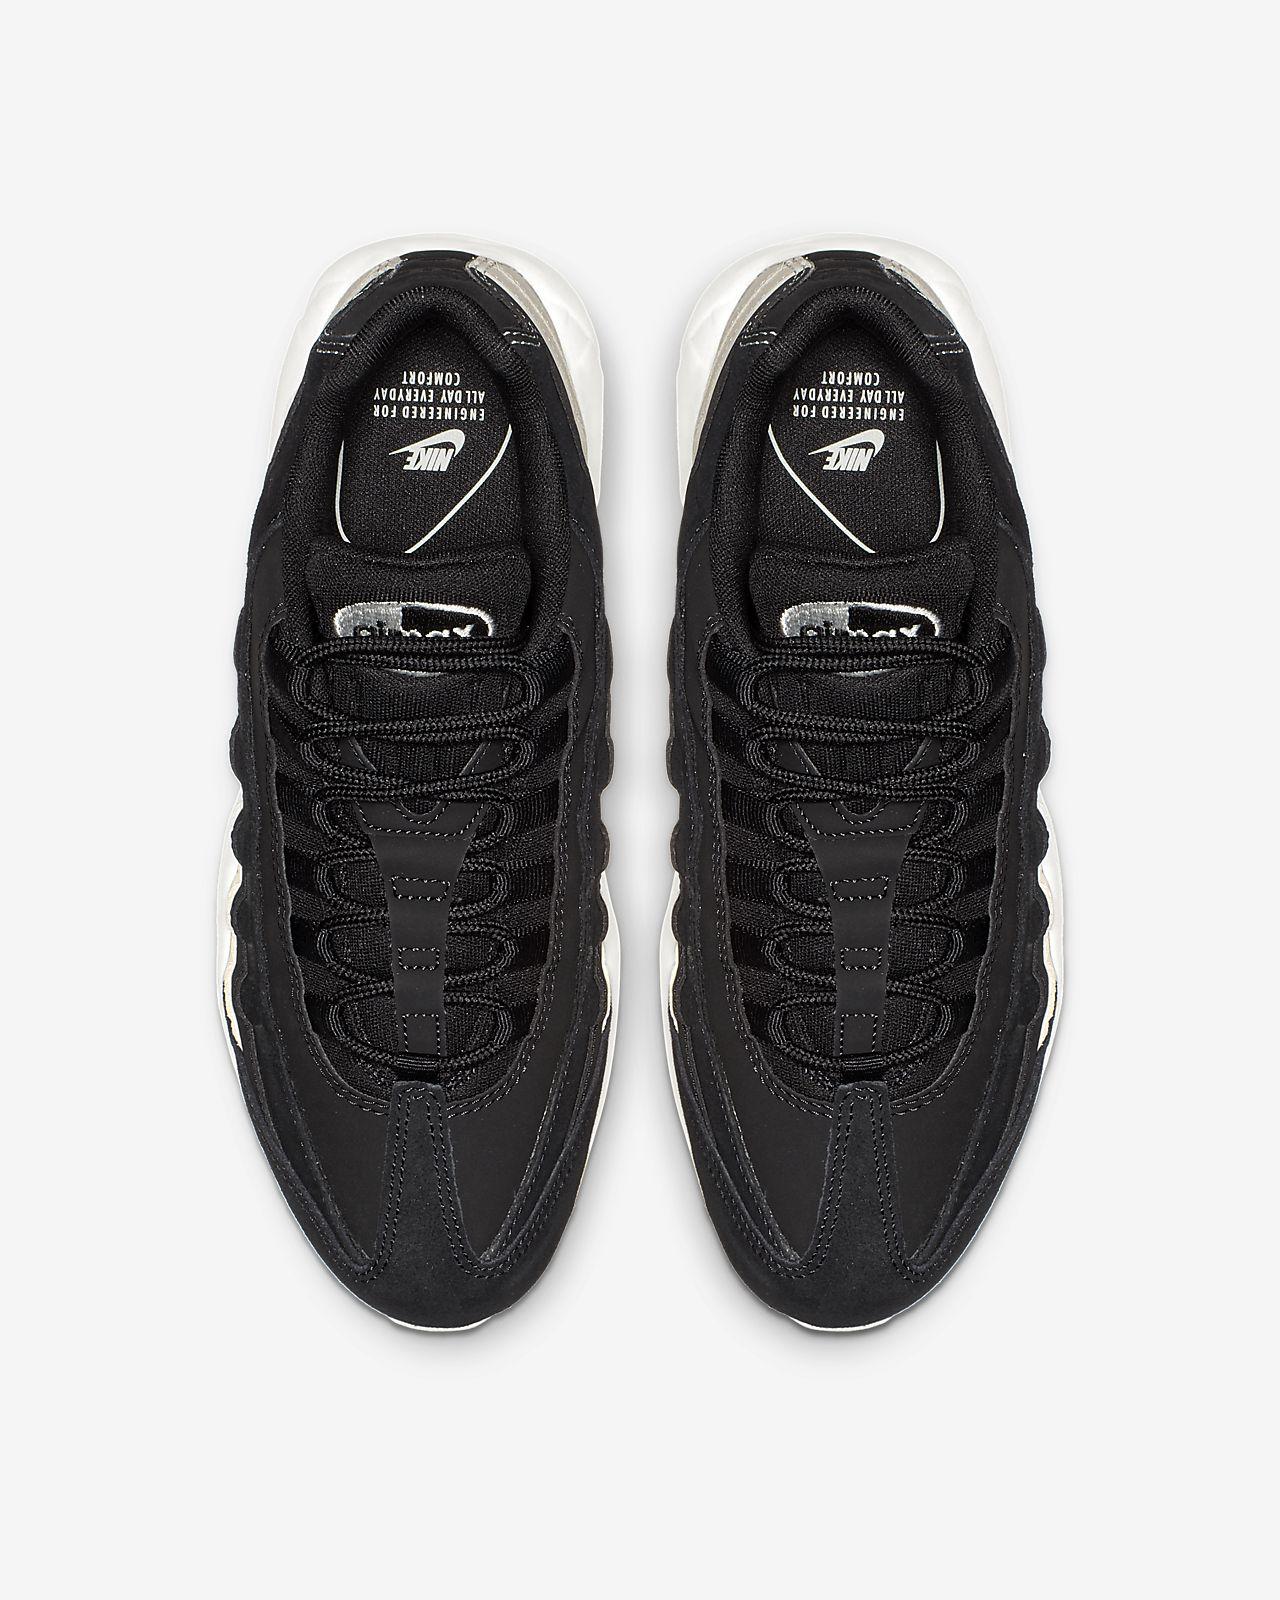 f44536ff86a Nike Air Max 95 Premium Women s Shoe. Nike.com GB